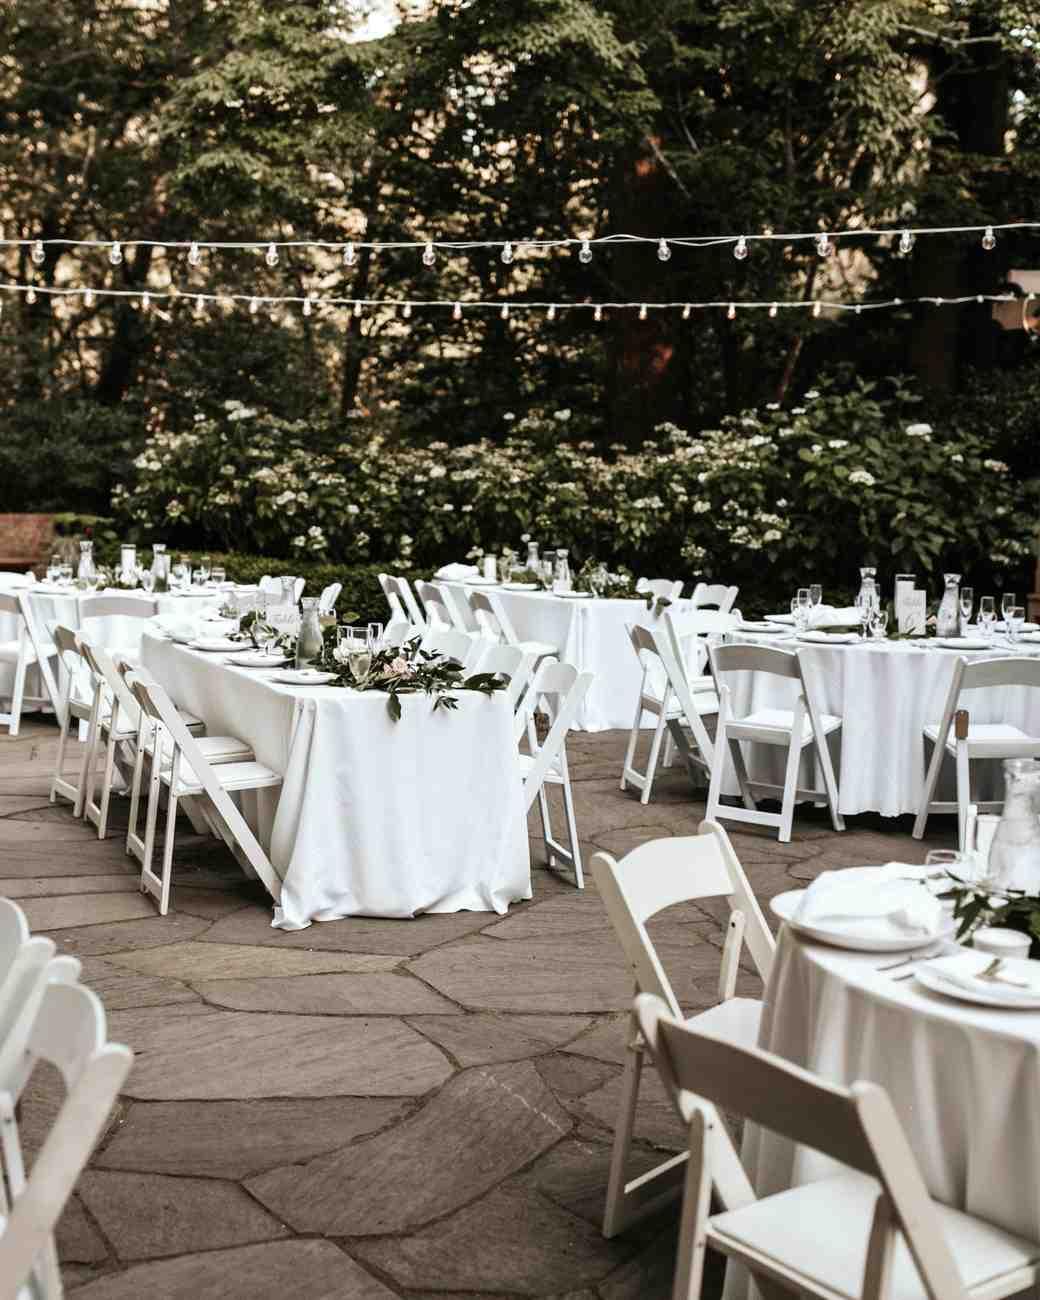 18 Beautiful Botanical Garden Wedding Venues: 25 Beautiful Garden Wedding Venues